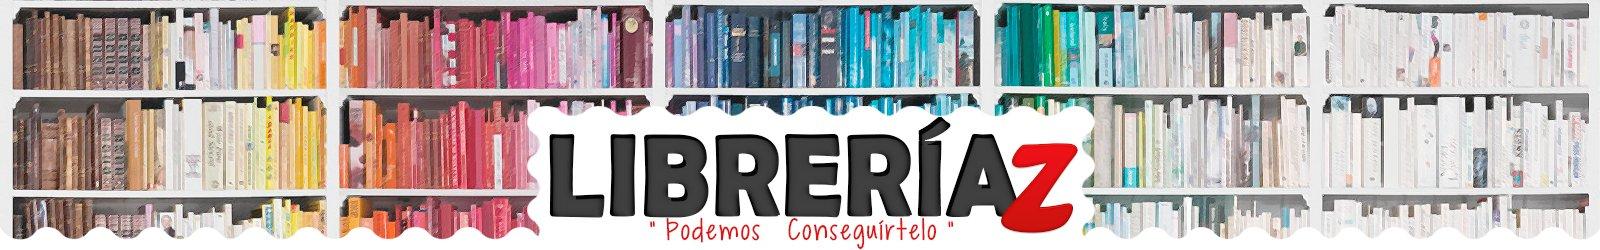 Libreria papelería Z,libros,fotocopias valladolid,fotocopias de libros valladolid, cedro valladolid